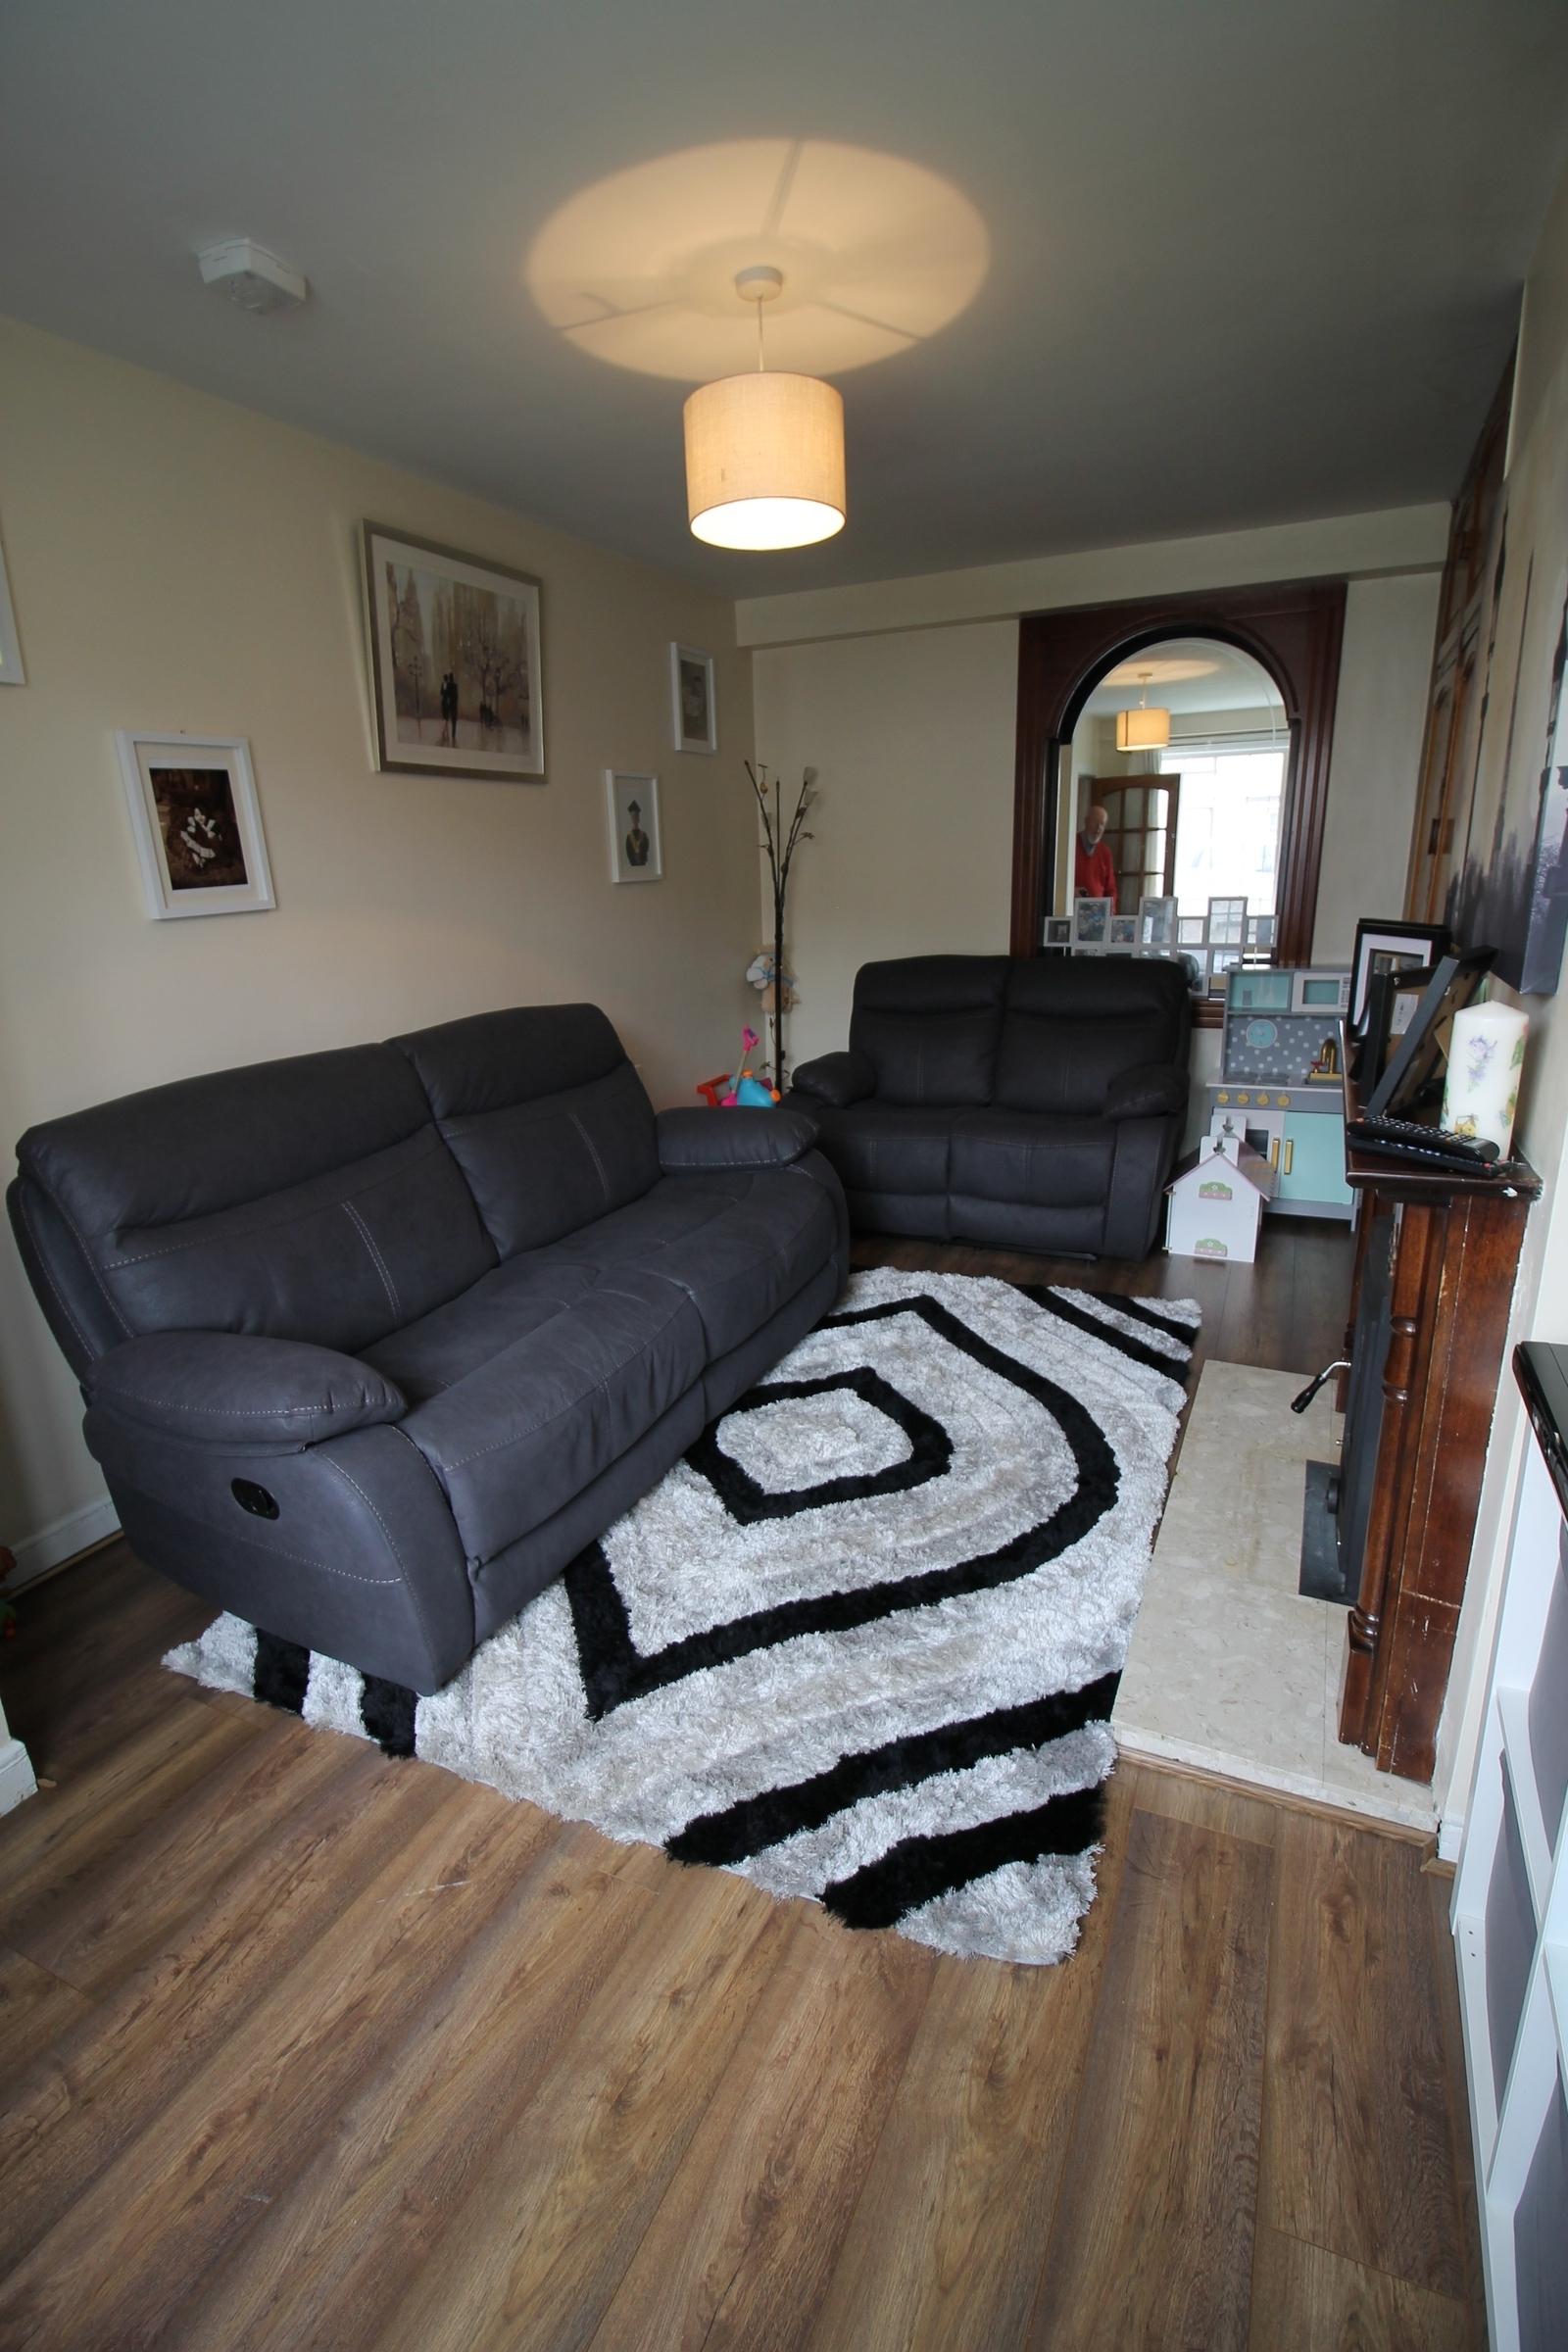 25 Sean Treacy Avenue, Thurles, Co. Tipperary